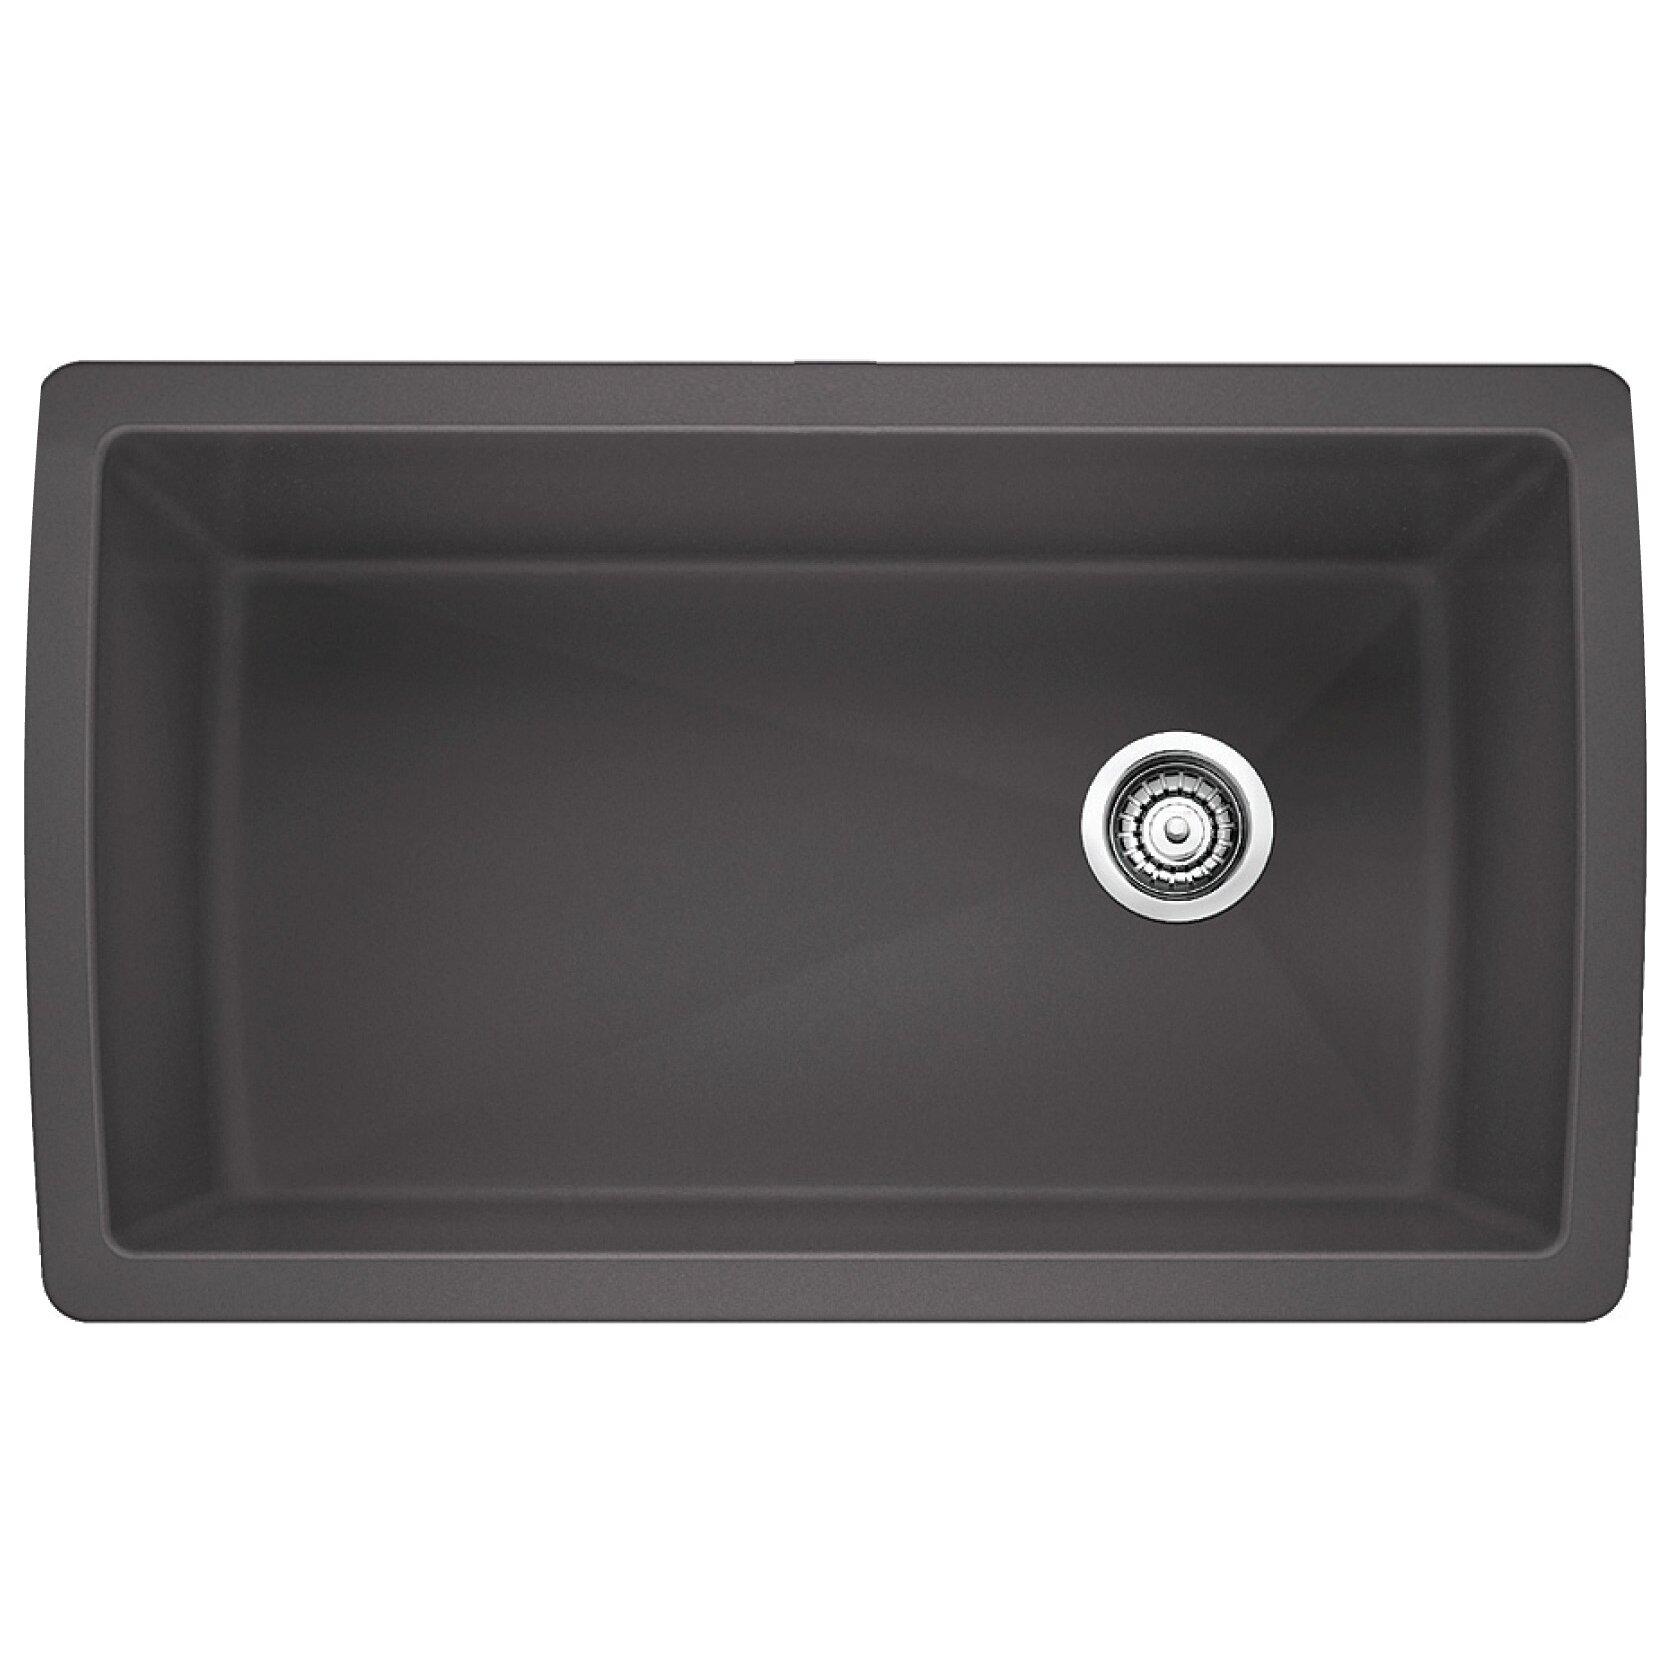 Blanco Sinks India : Sinks Rectangular Wall Mount Kitchen Sink Copper Apron Kitchen Sink ...